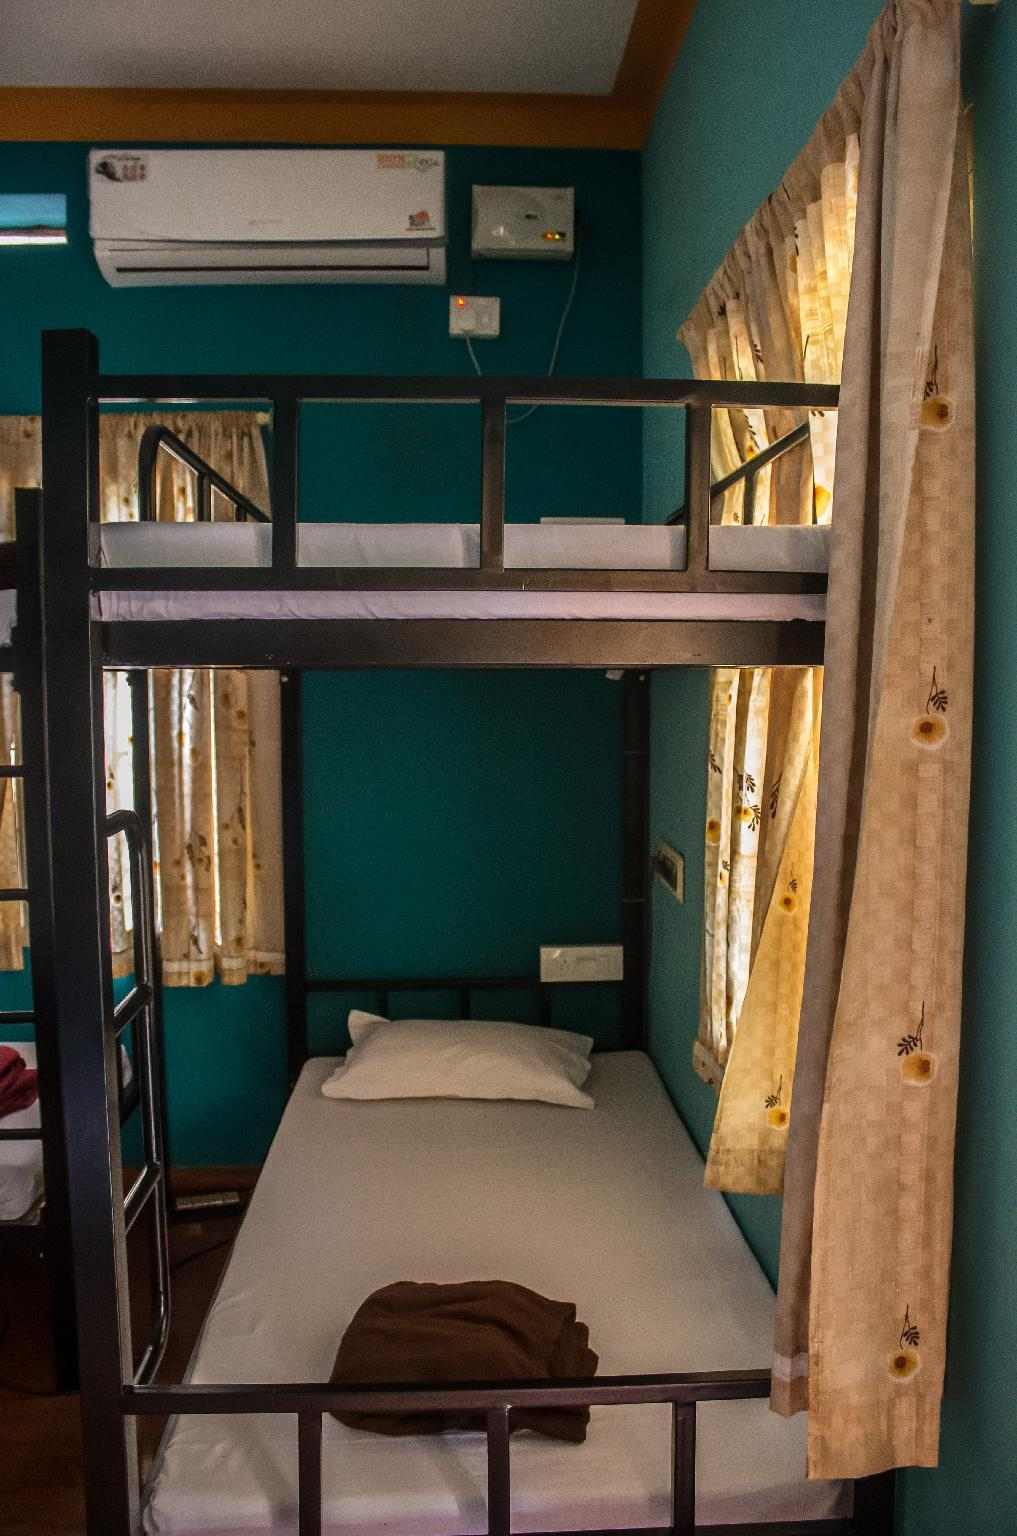 Hostel Lit